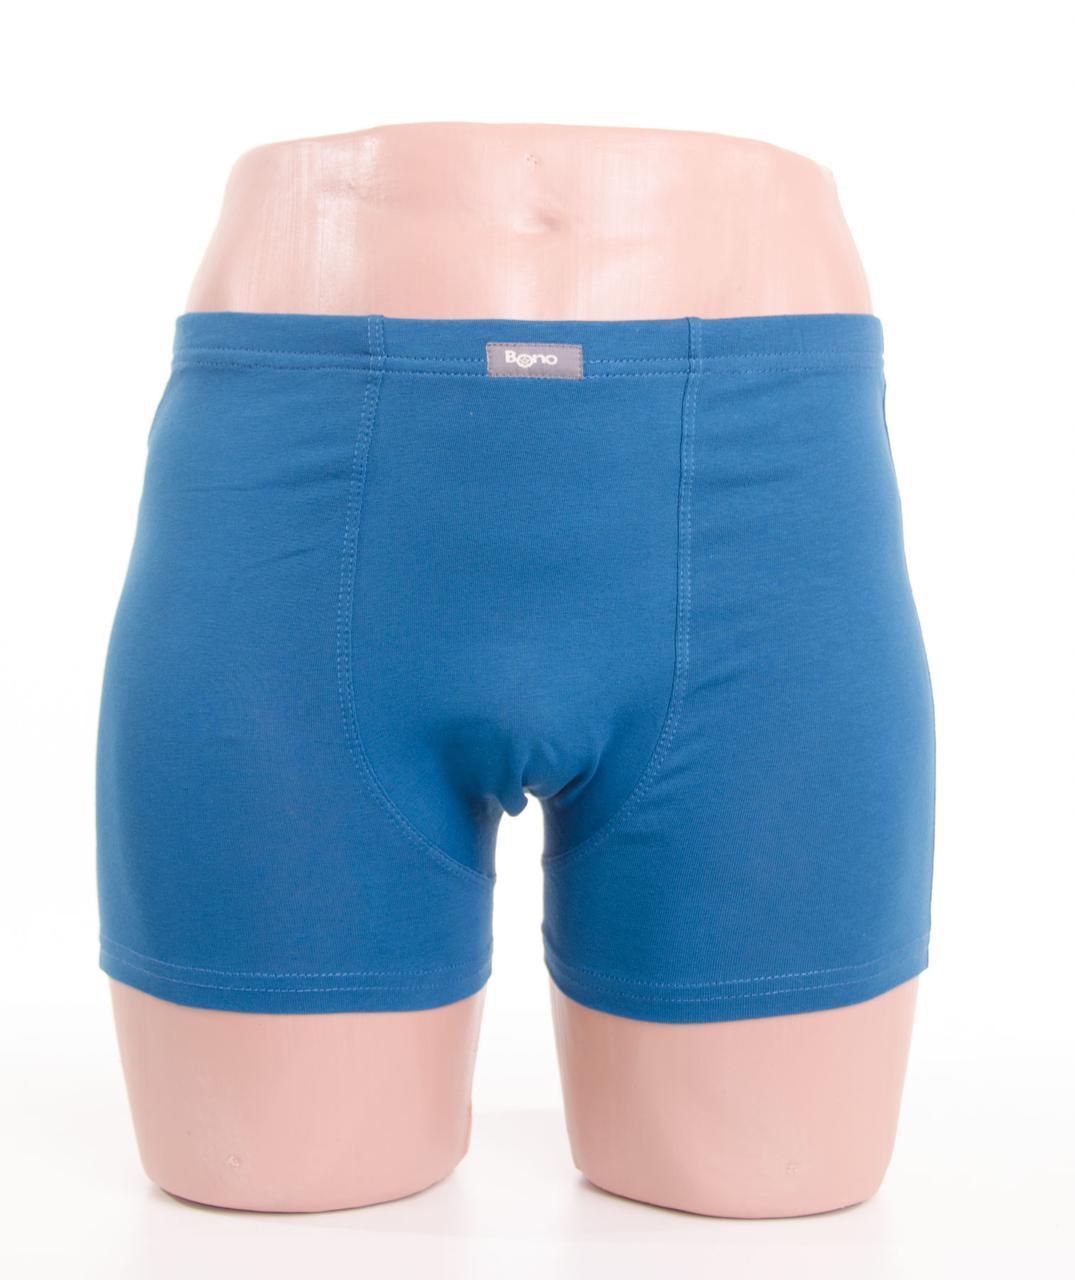 Bono Труси шорти 950015